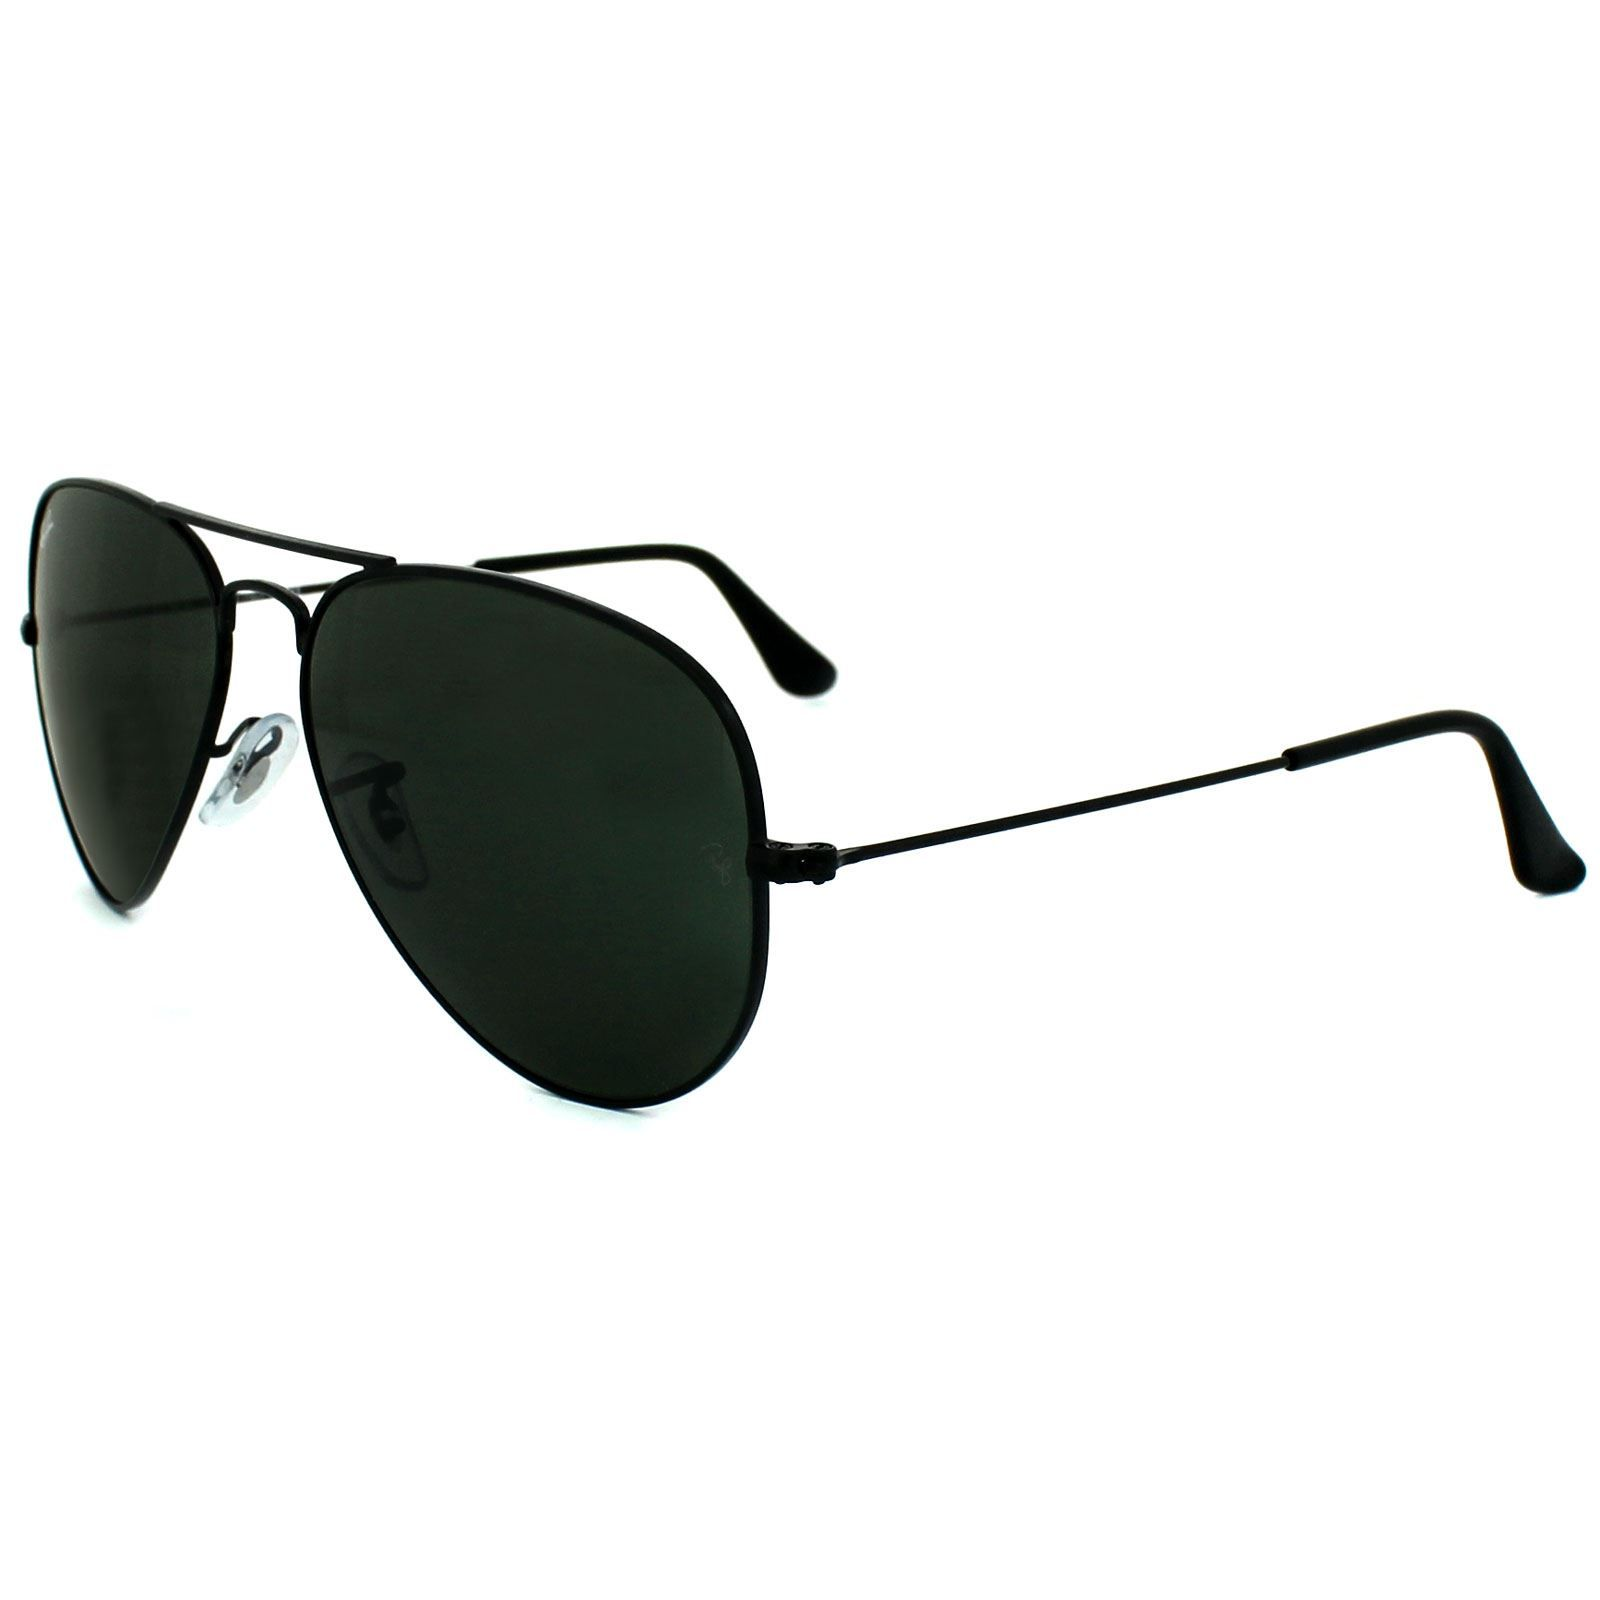 Ray-Ban Sunglasses Aviator 3025 L2823 Black Green